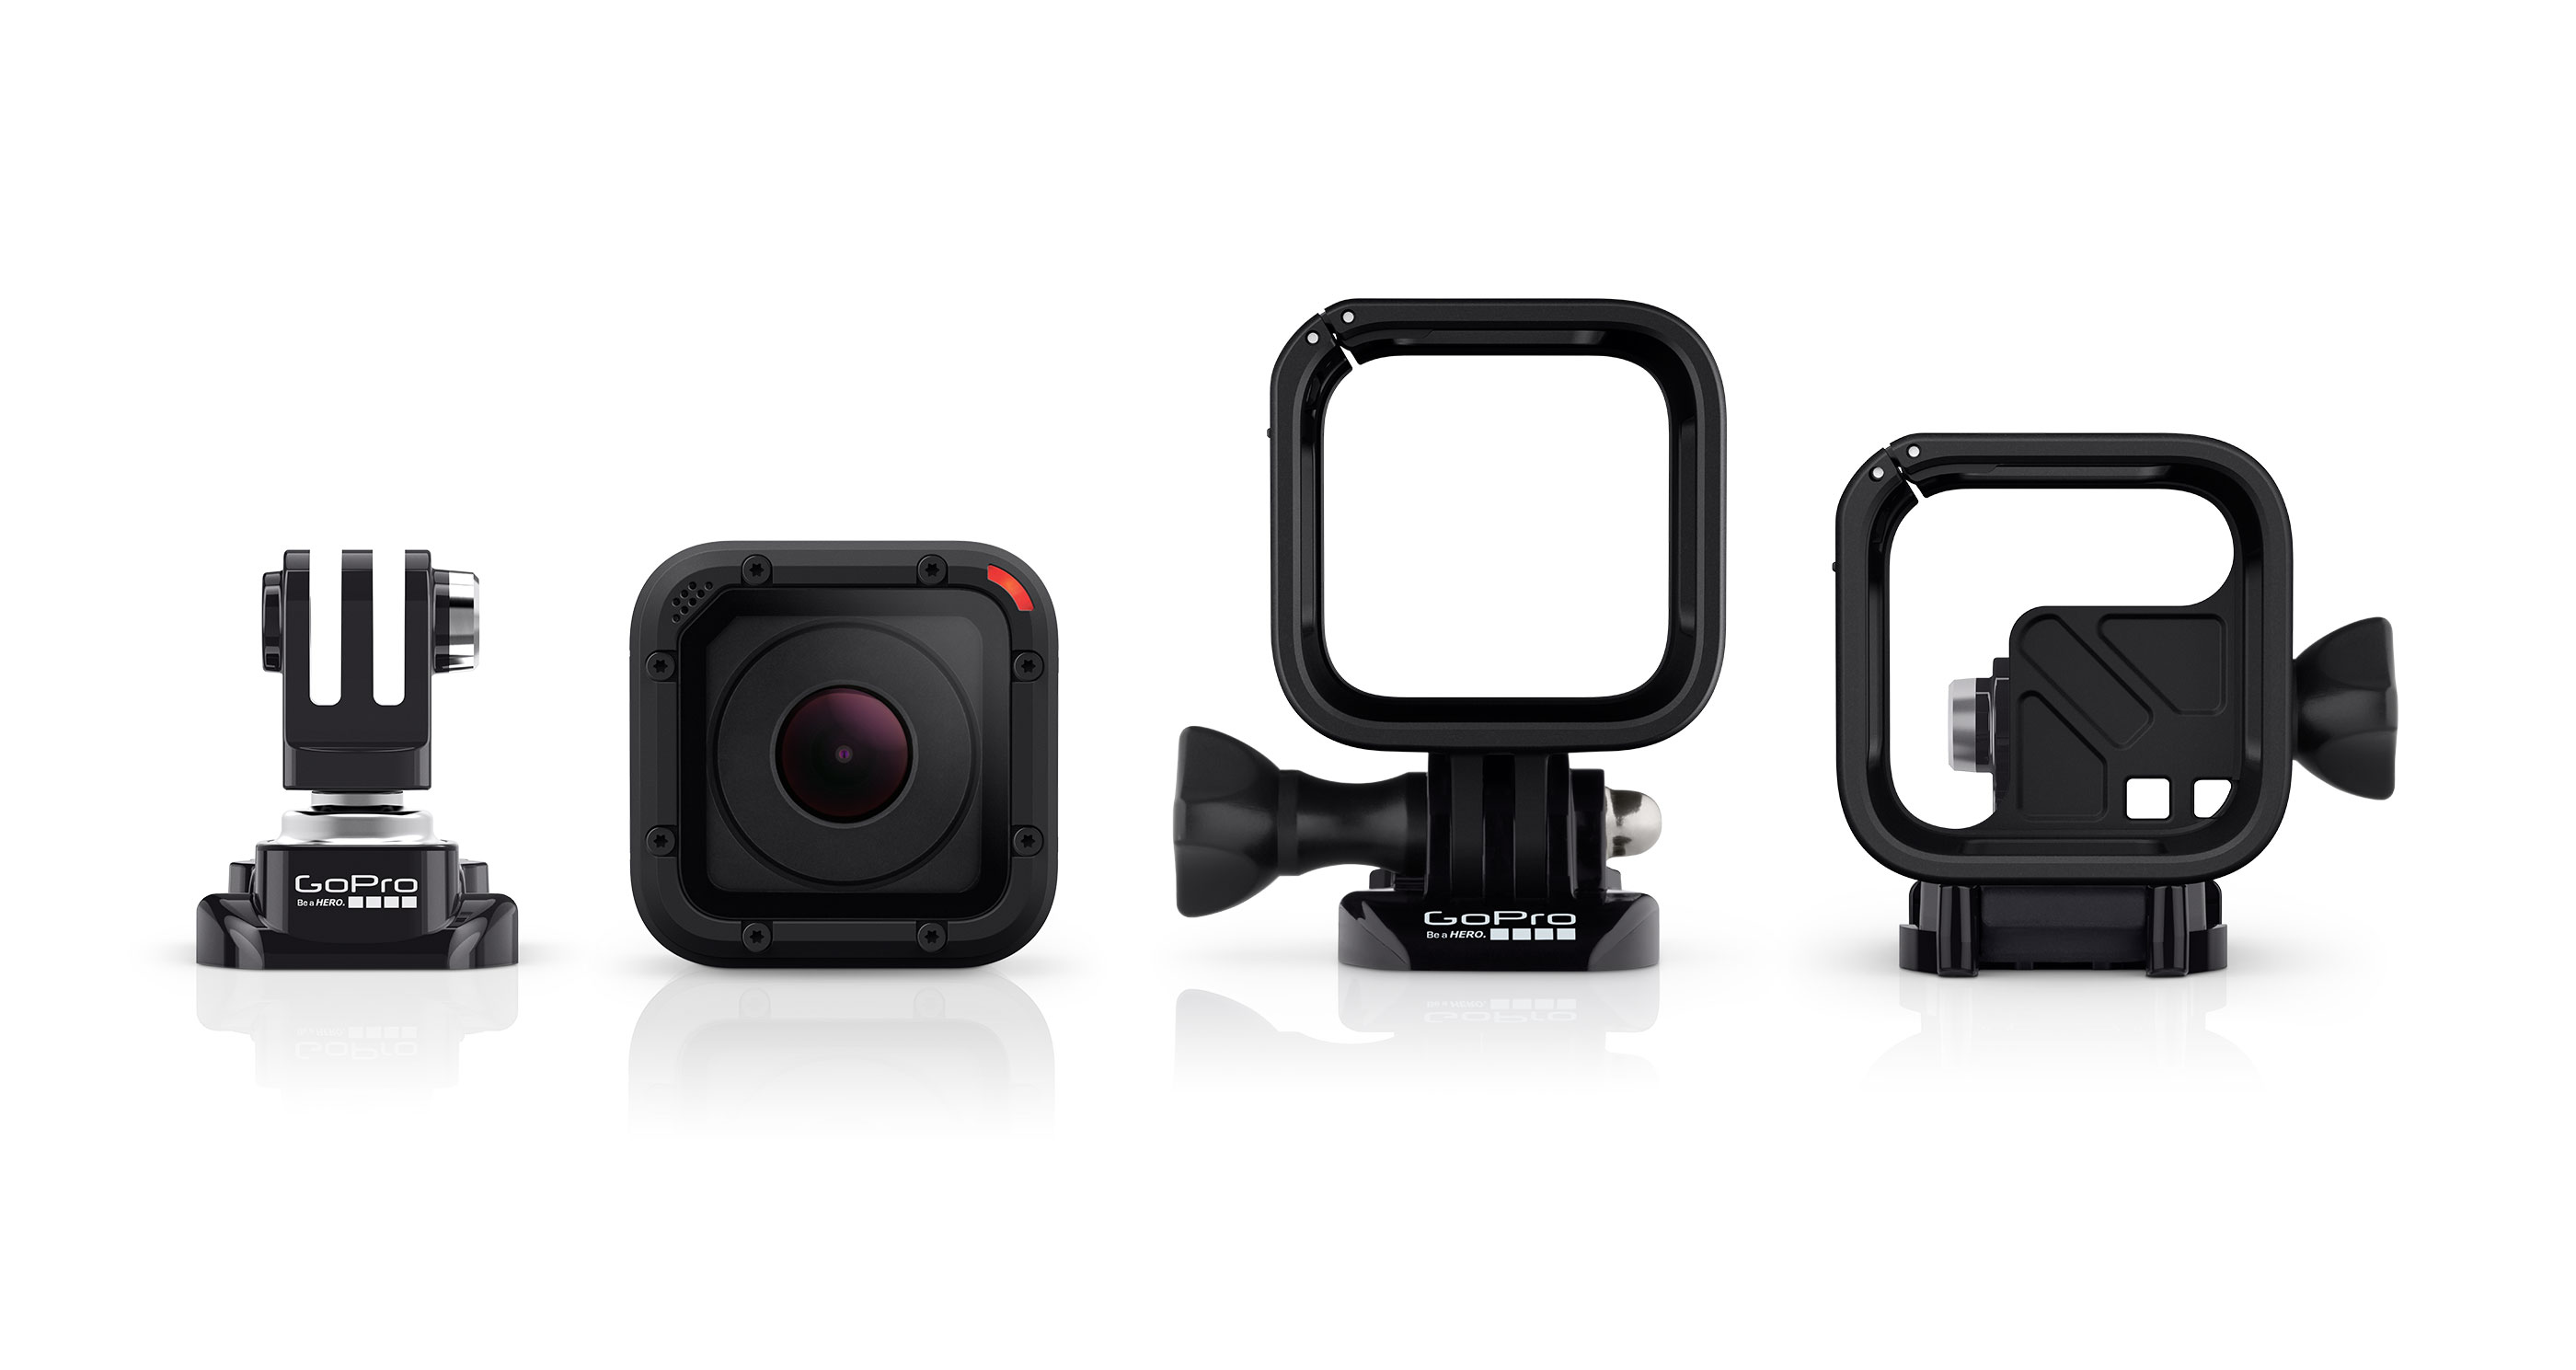 GoPro Hero 4 Session CHCHS-101 - CHDHS-101 - Helmet Cameras - GoPro